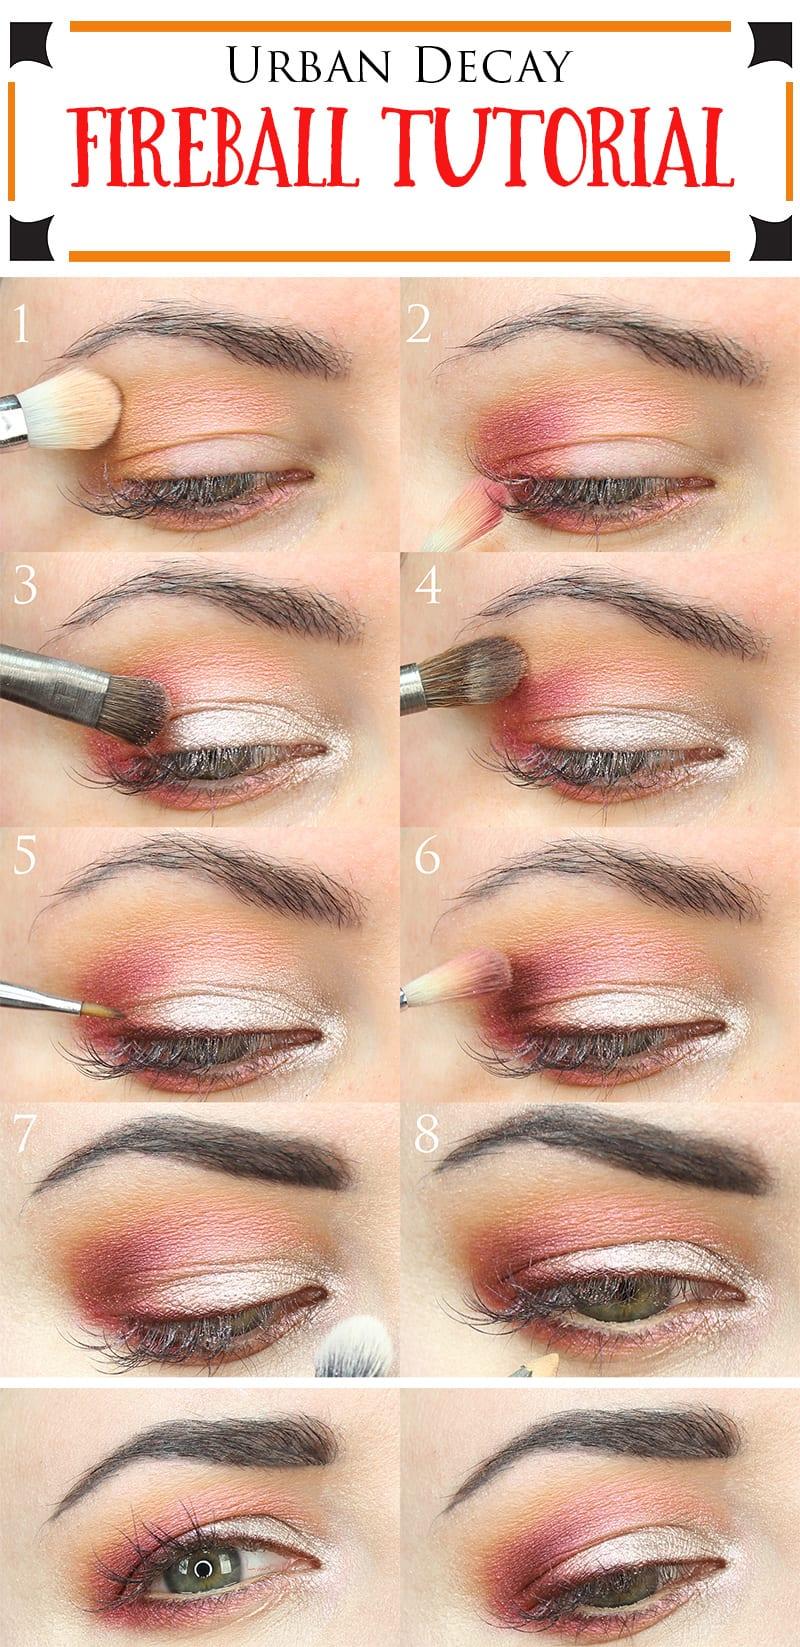 Easy Eyeliner Tutorial - YouTube